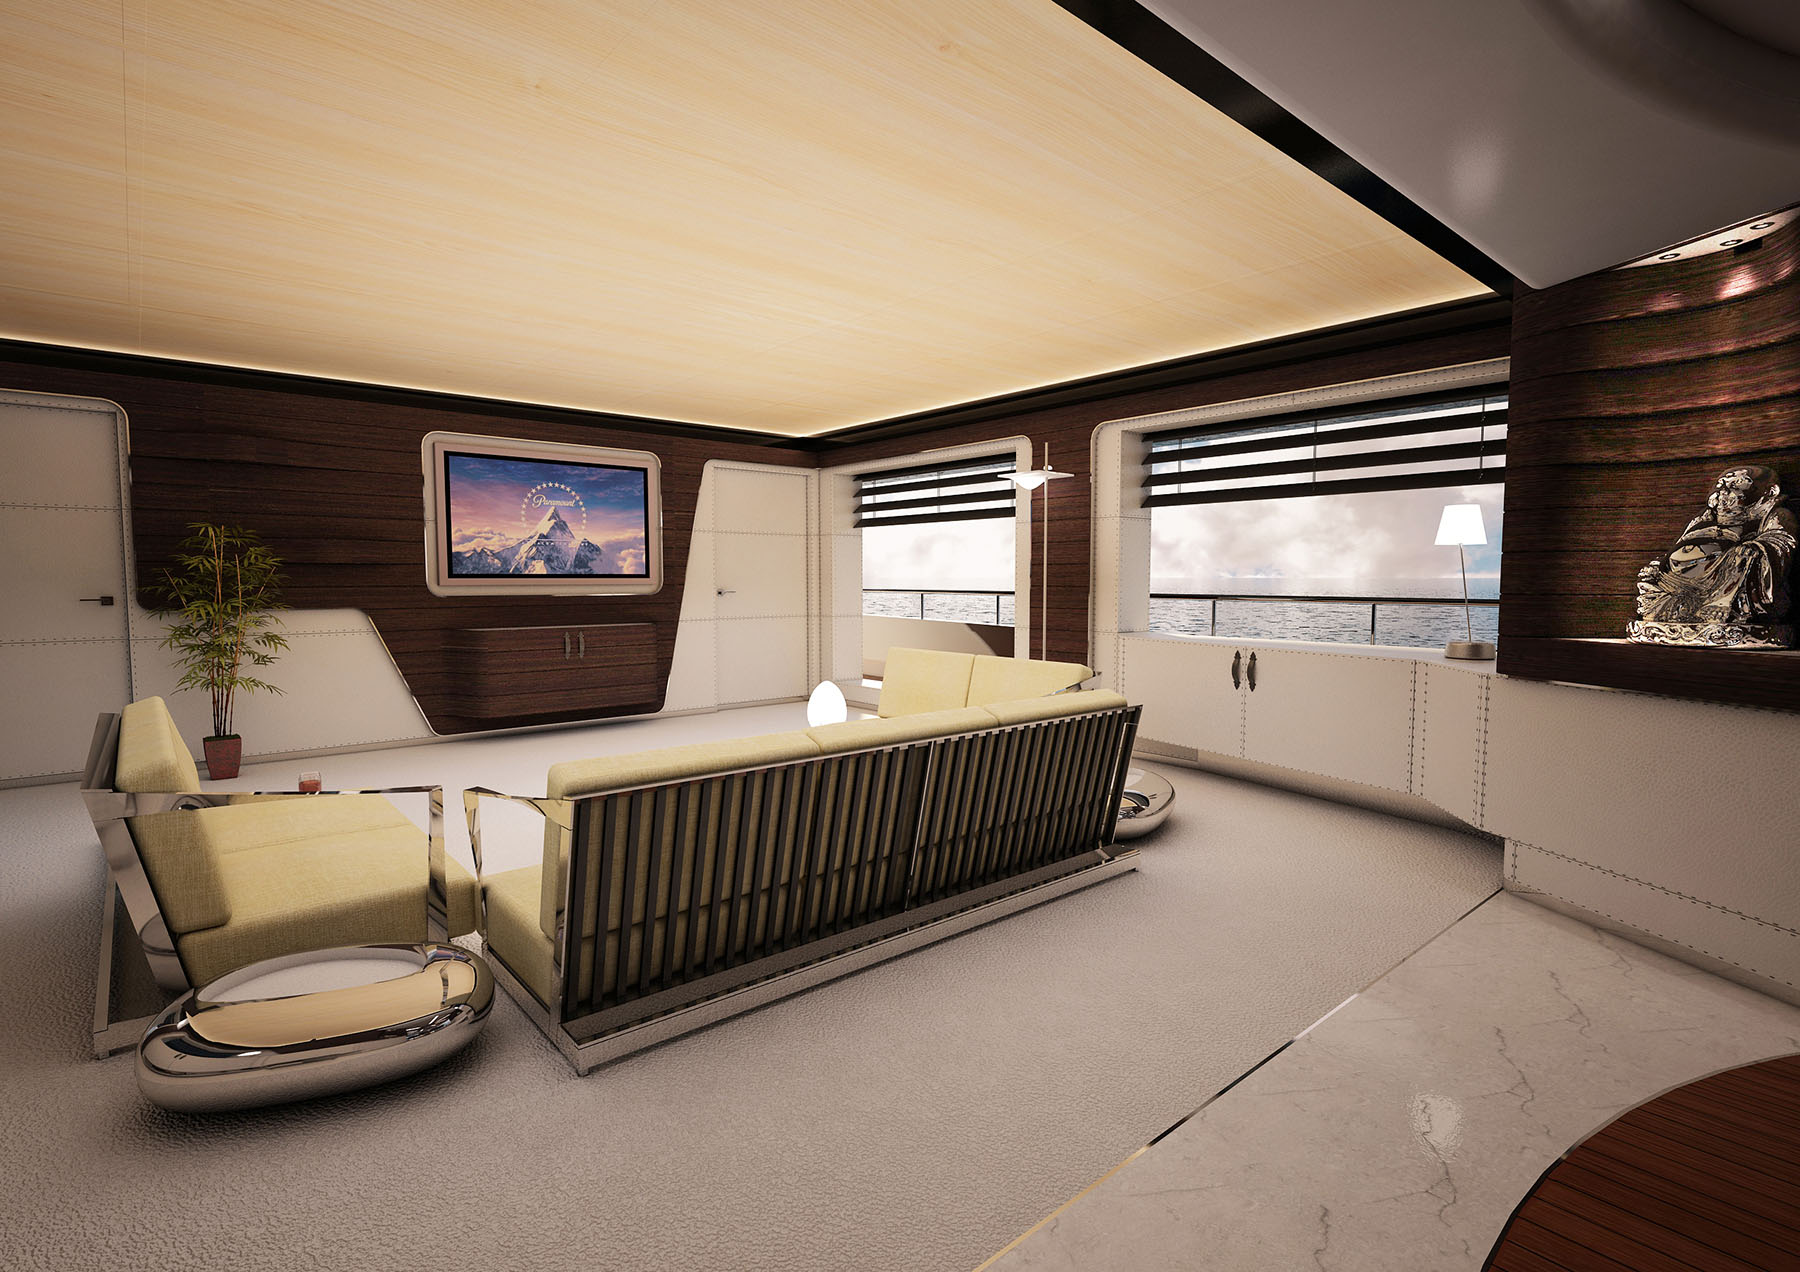 Cabin aboard M/Y OMBRA 37 Yacht for Sale